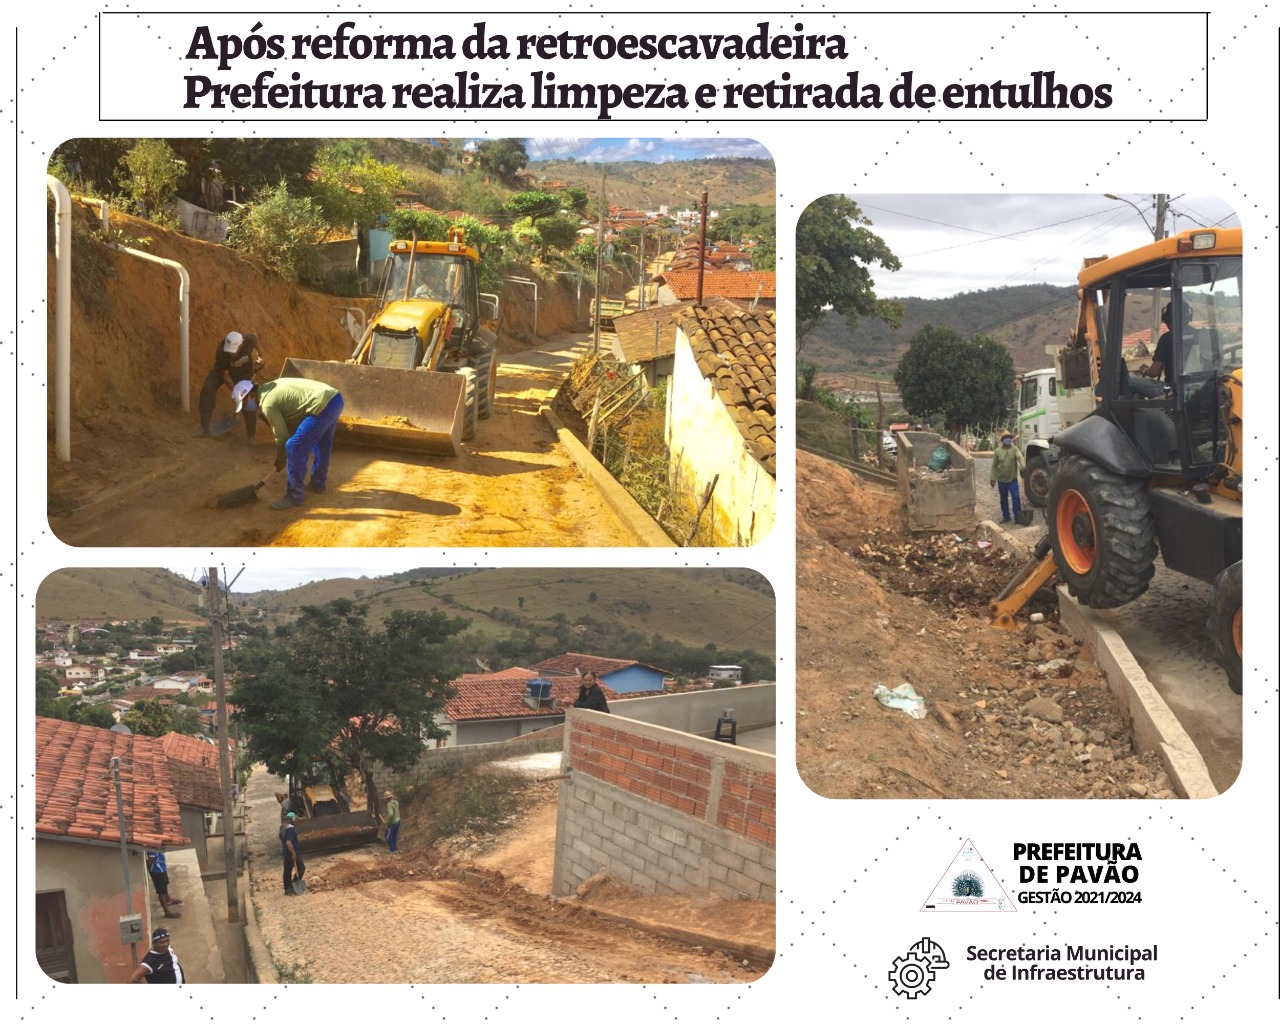 PREFEITURA REALIZA LIMPEZA E RETIRADA DE ENTULHOS